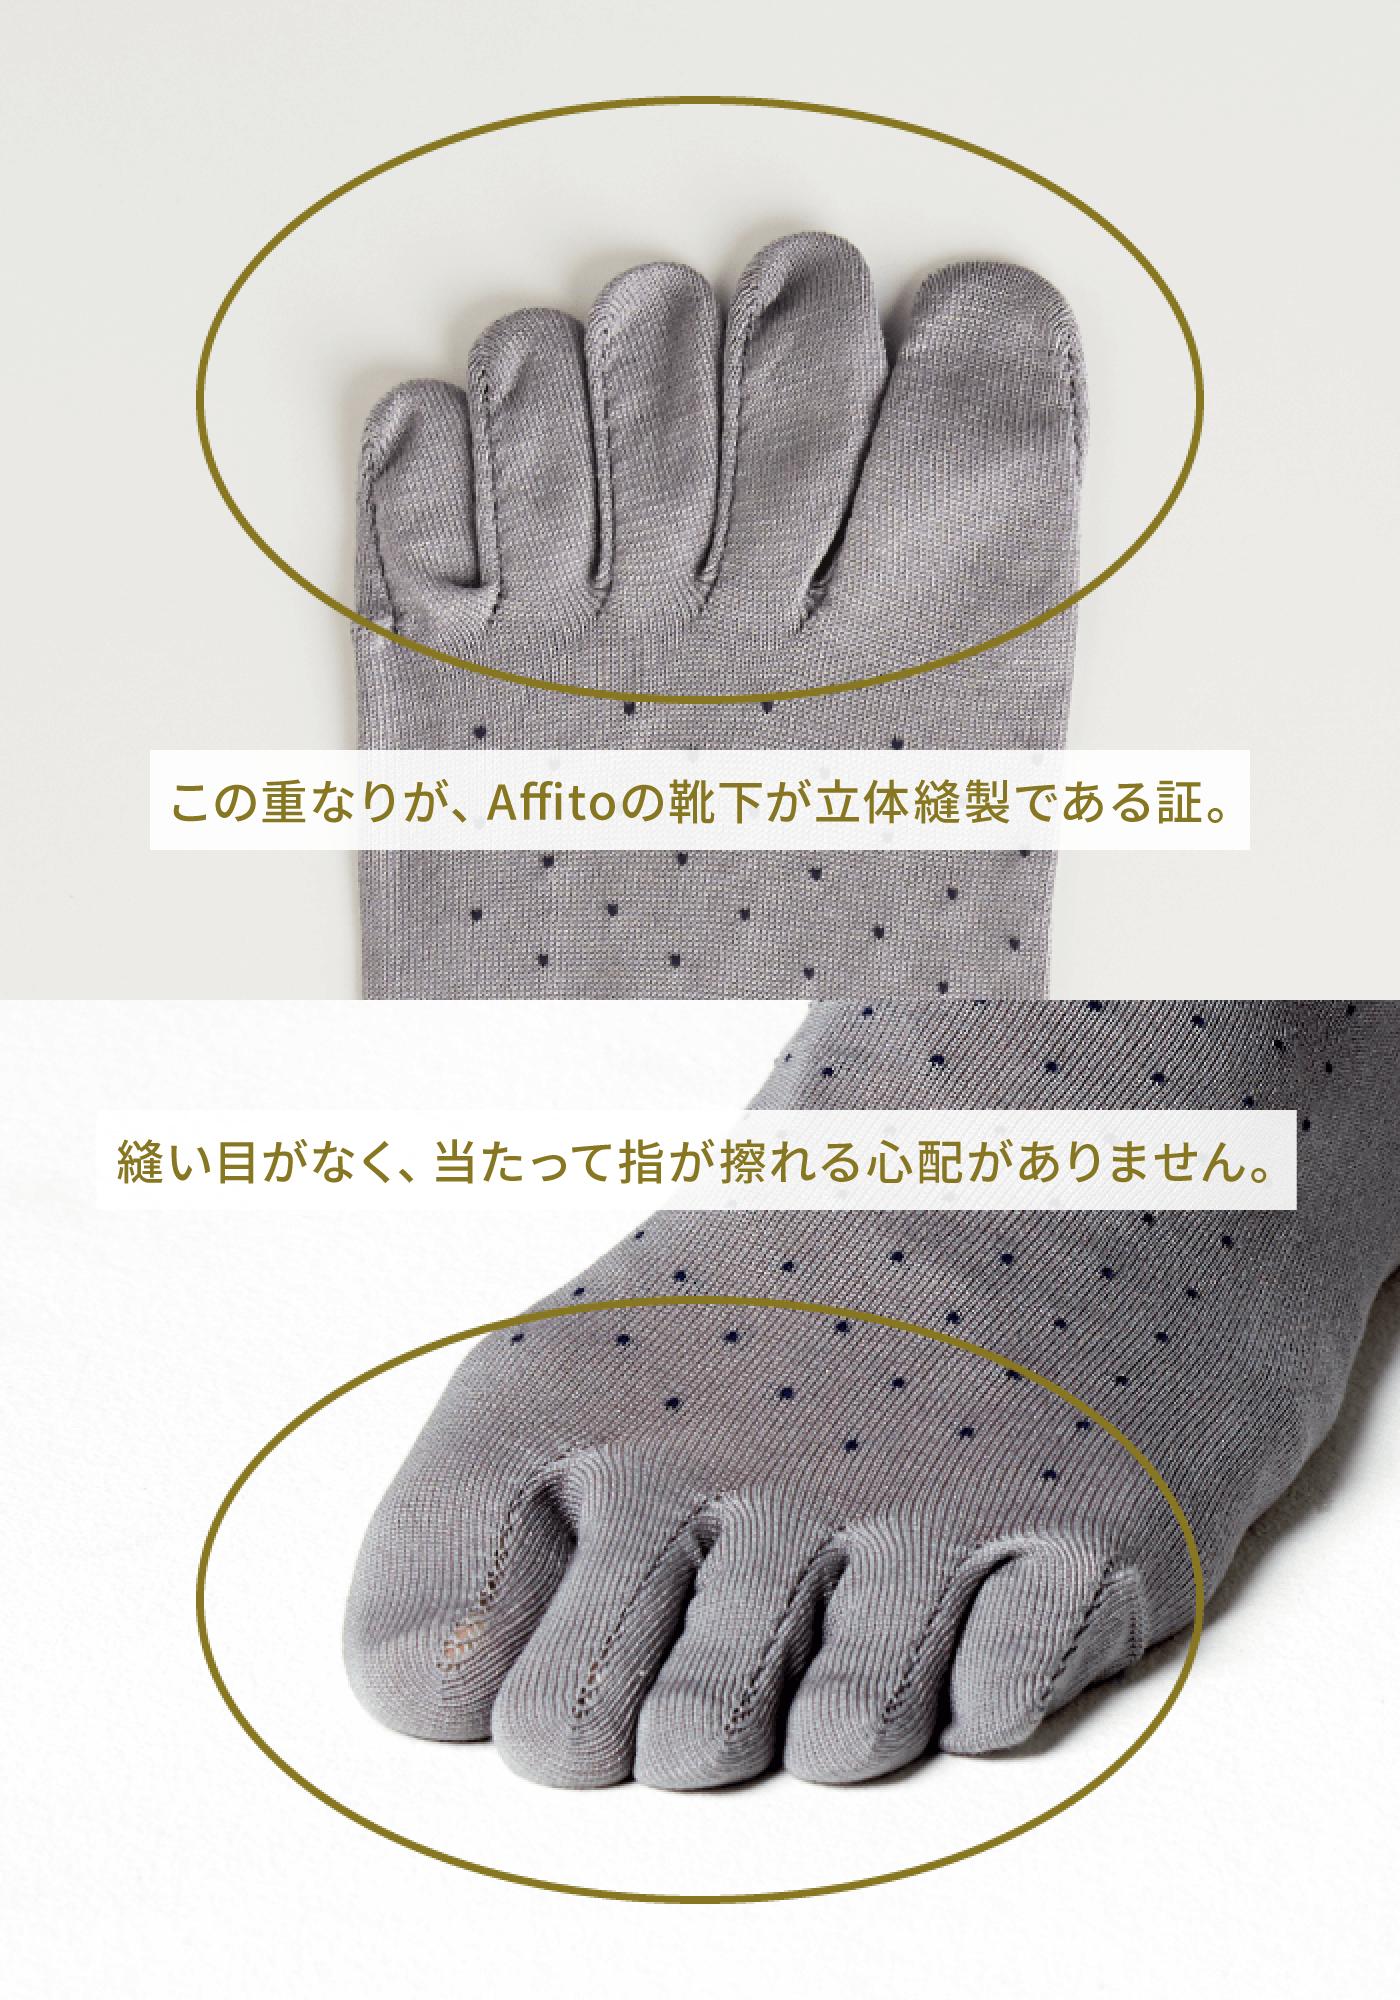 Affito 丸編み五本指ソックス